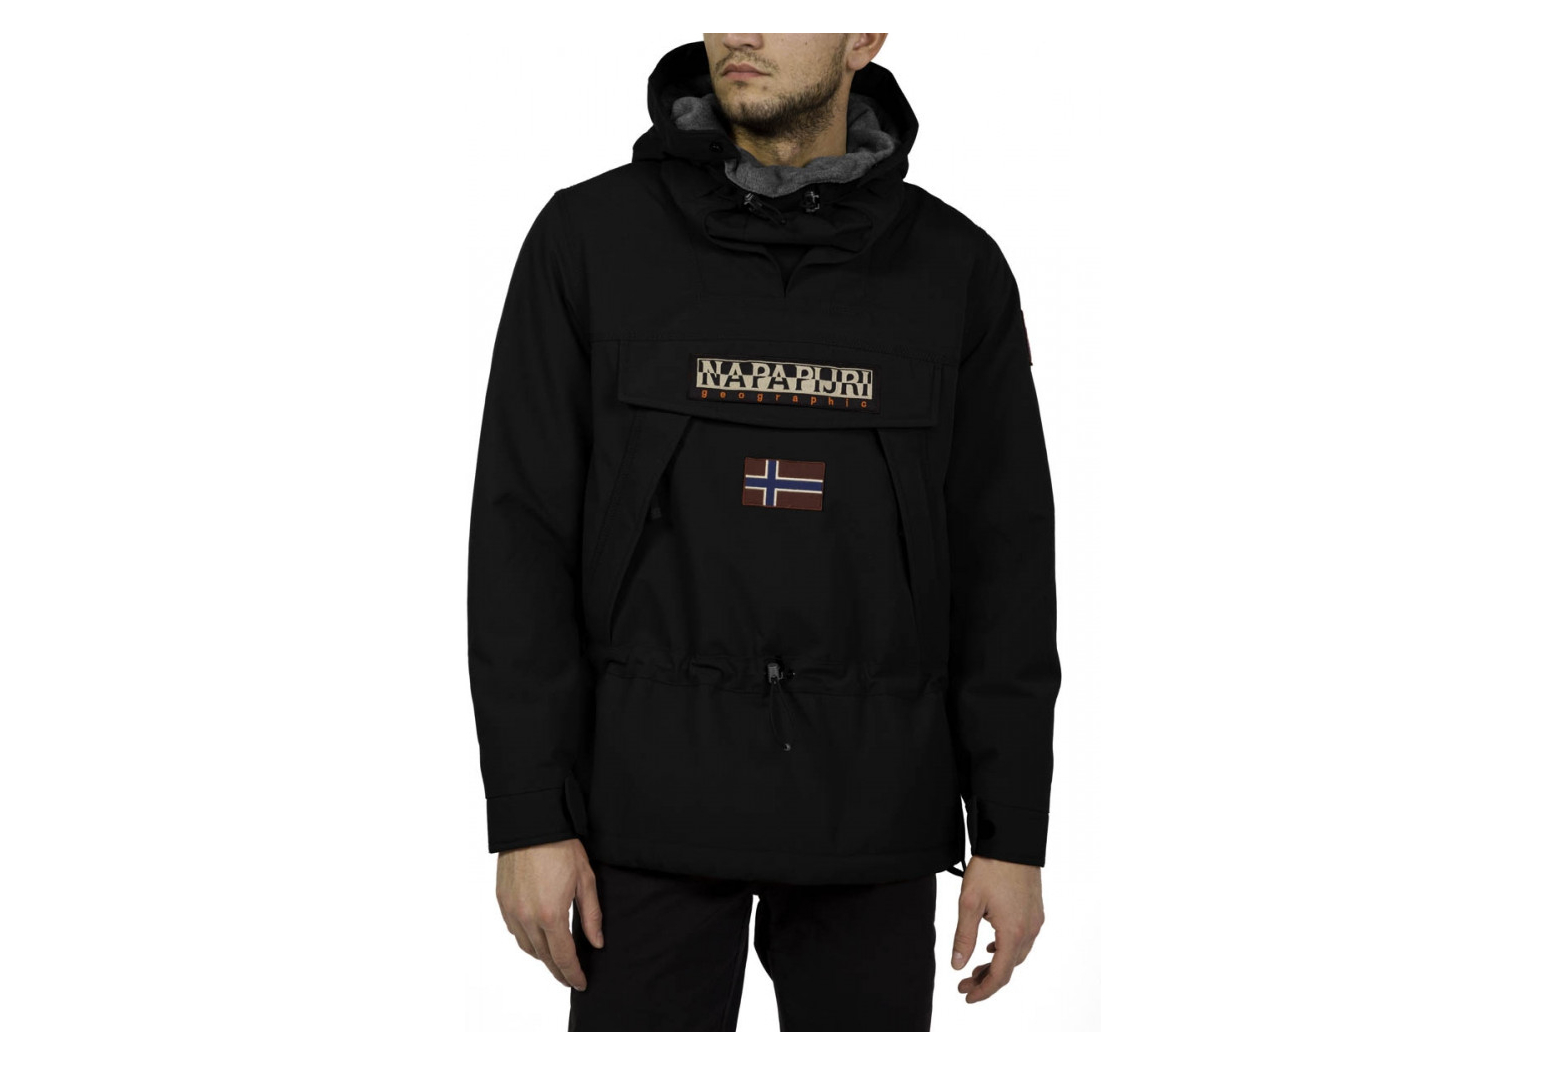 code promo 22c47 89423 Veste De Ski Napapijri Skidoo 2 Black